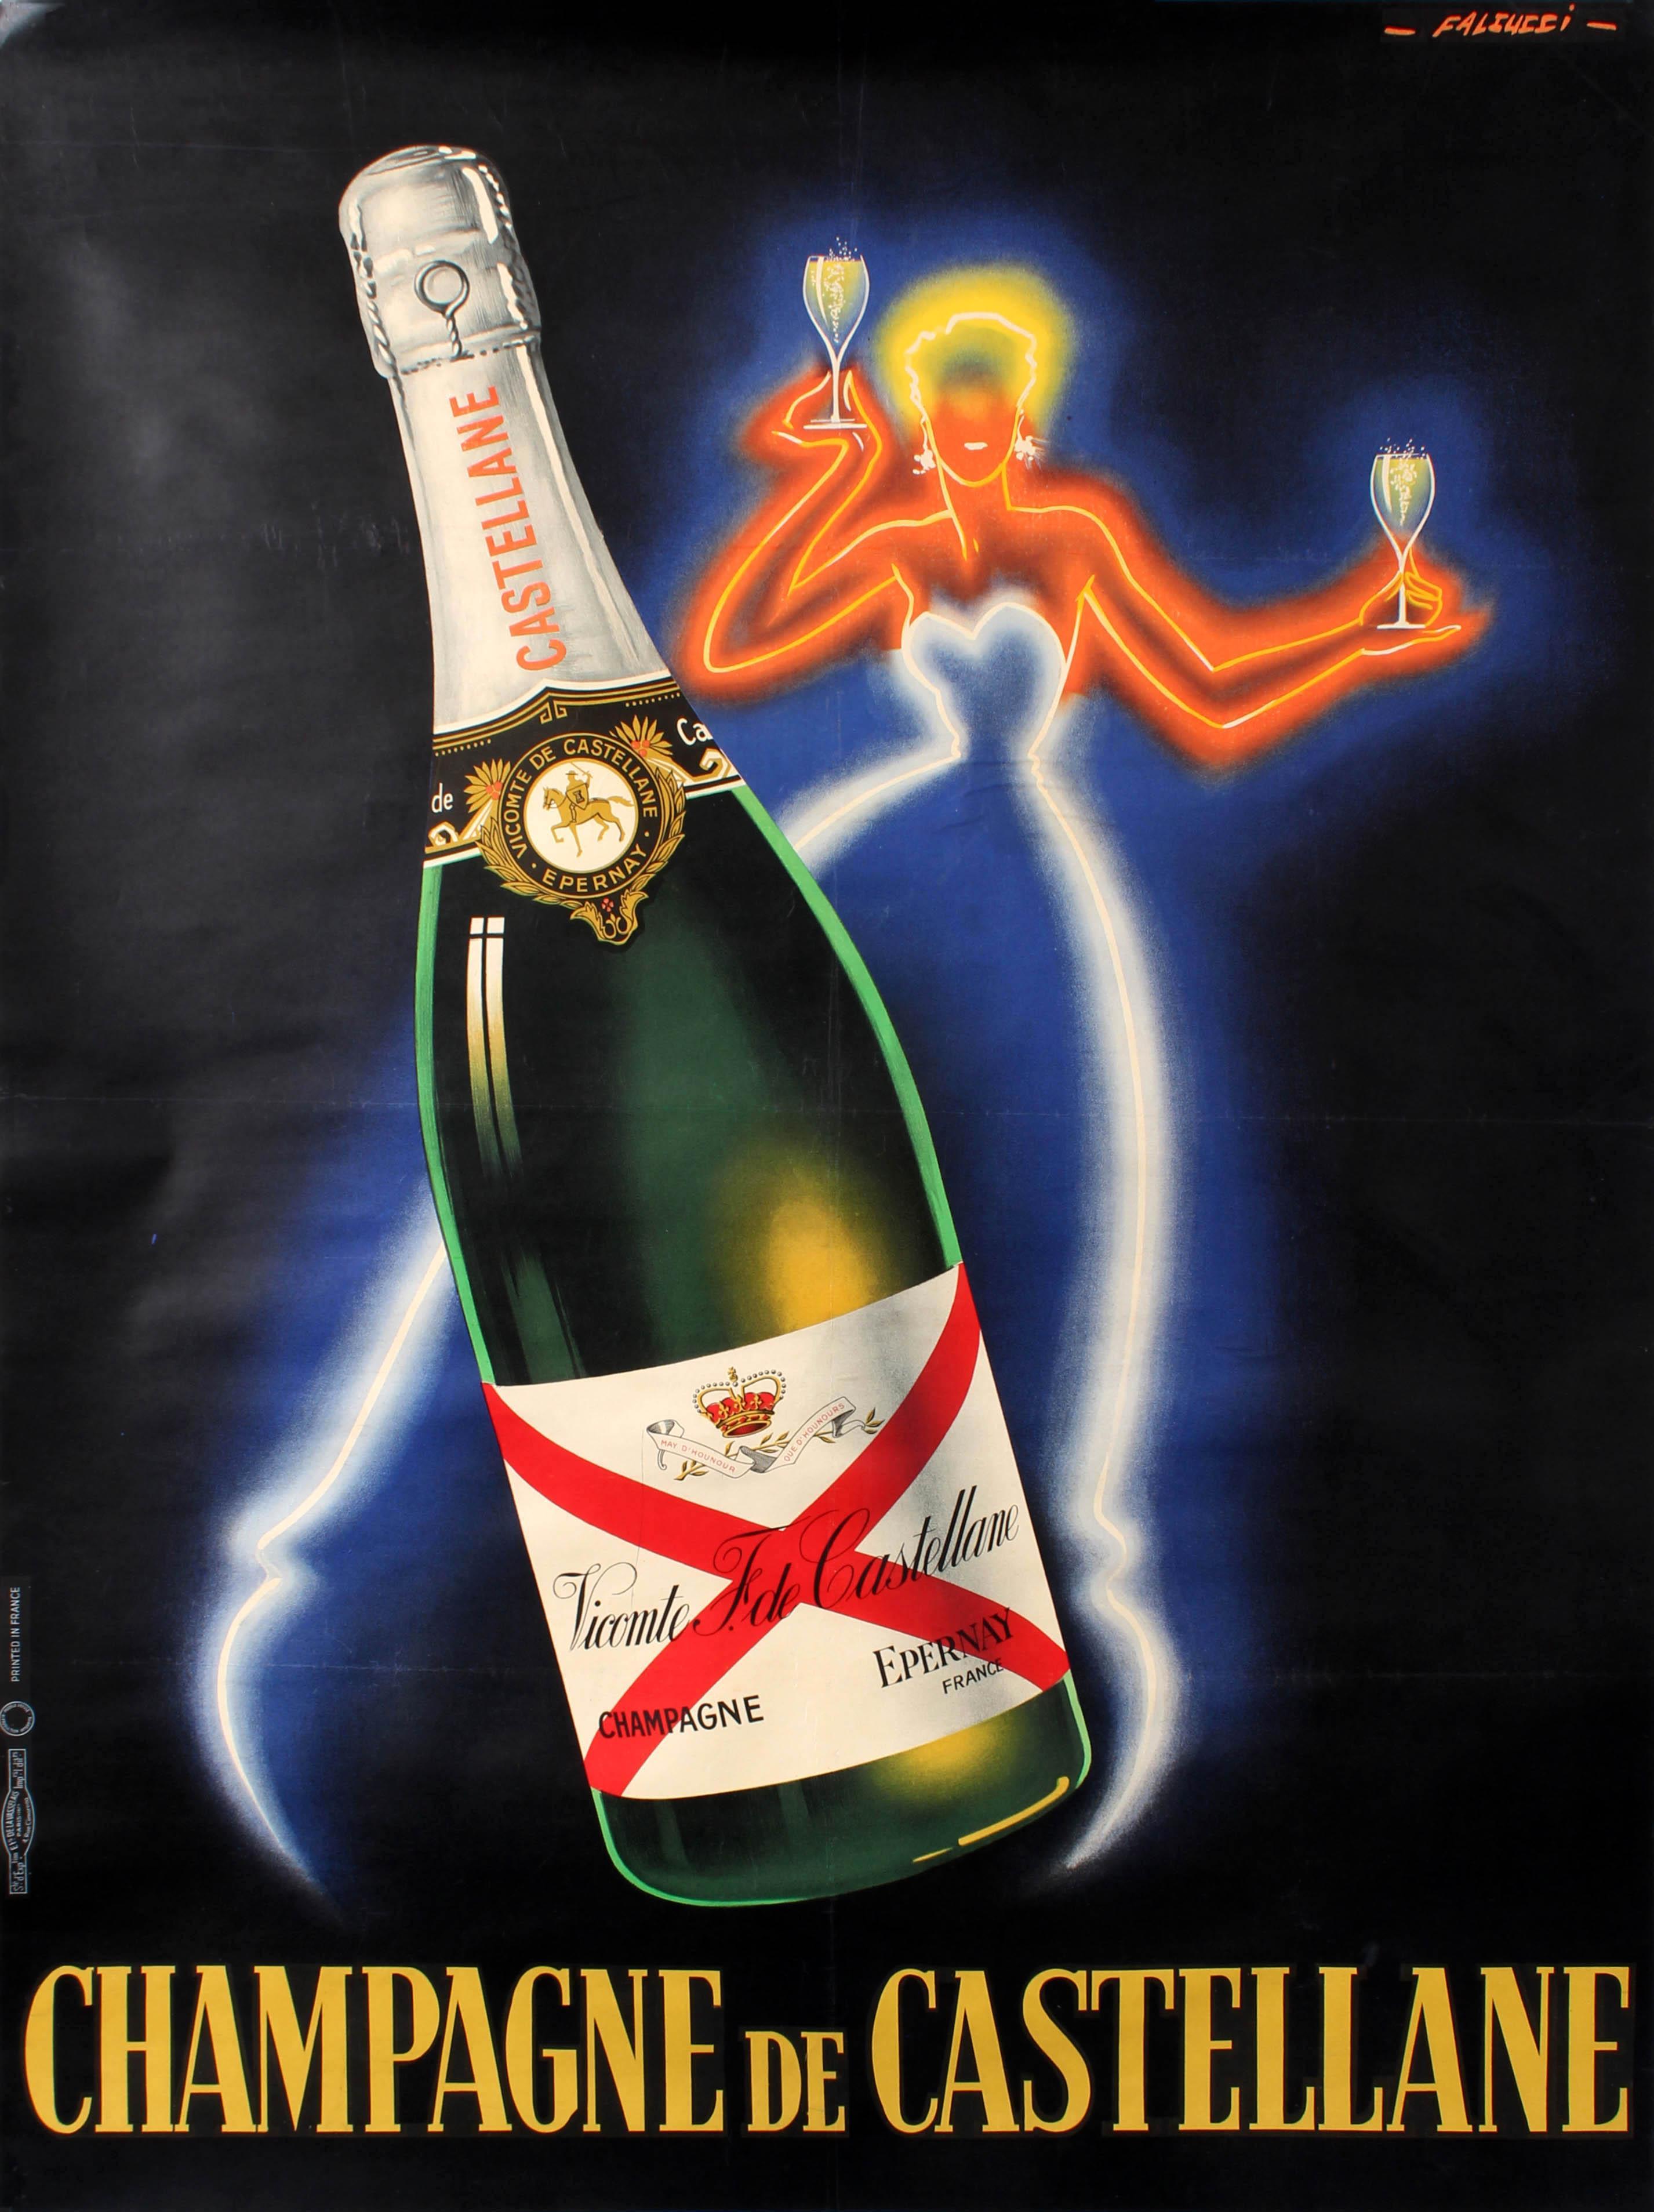 original vintage champagne de castellane poster by falcucci neon design drink ad